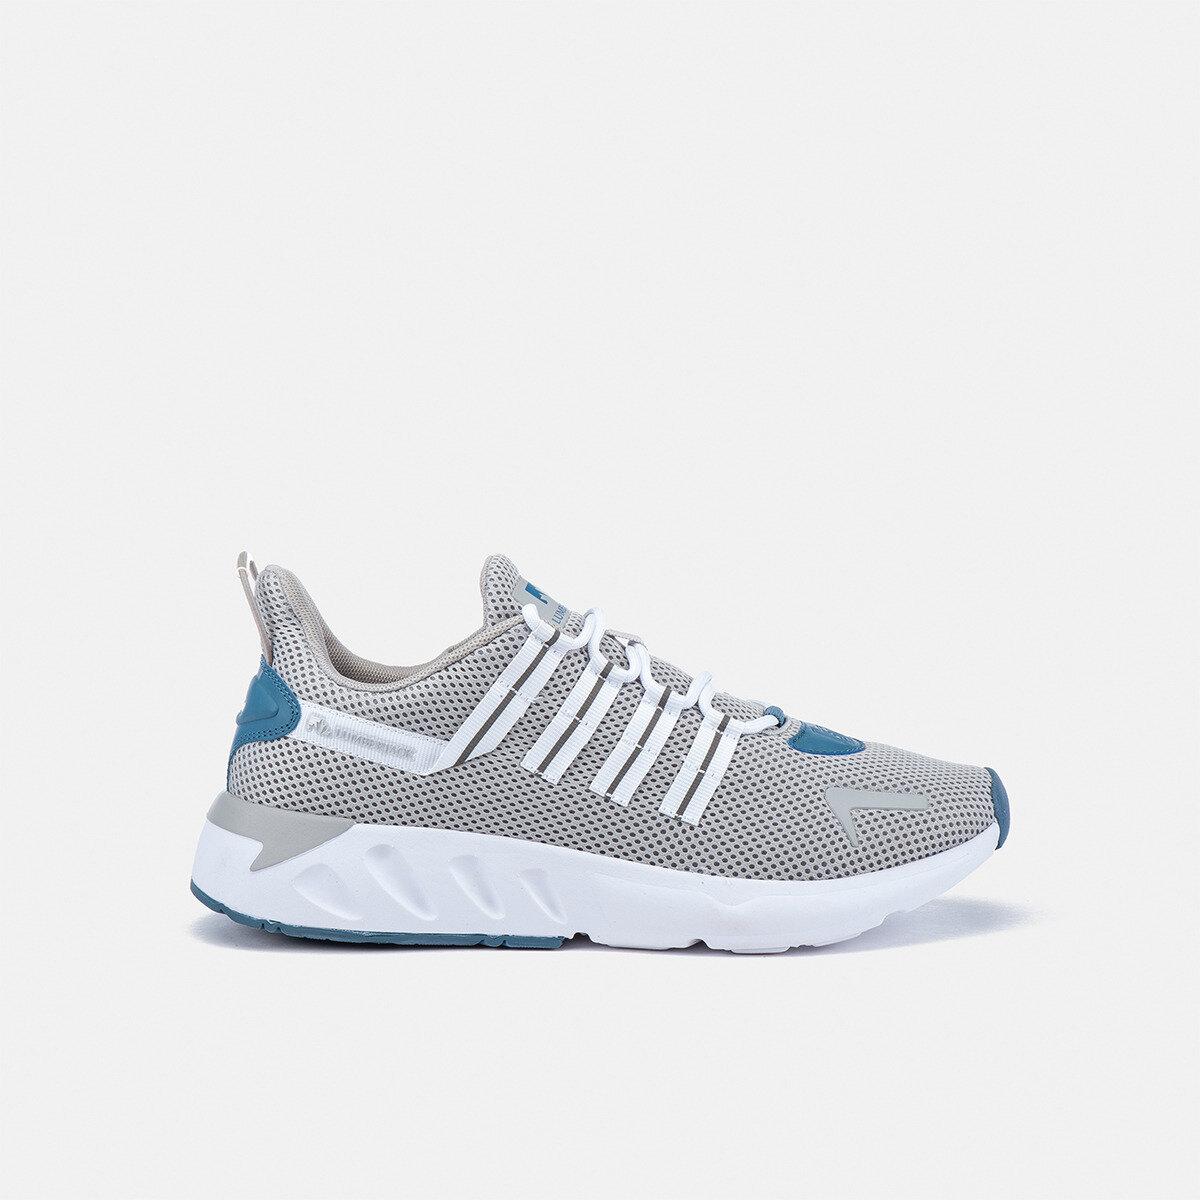 ELIUD LT GREY Man Running shoes